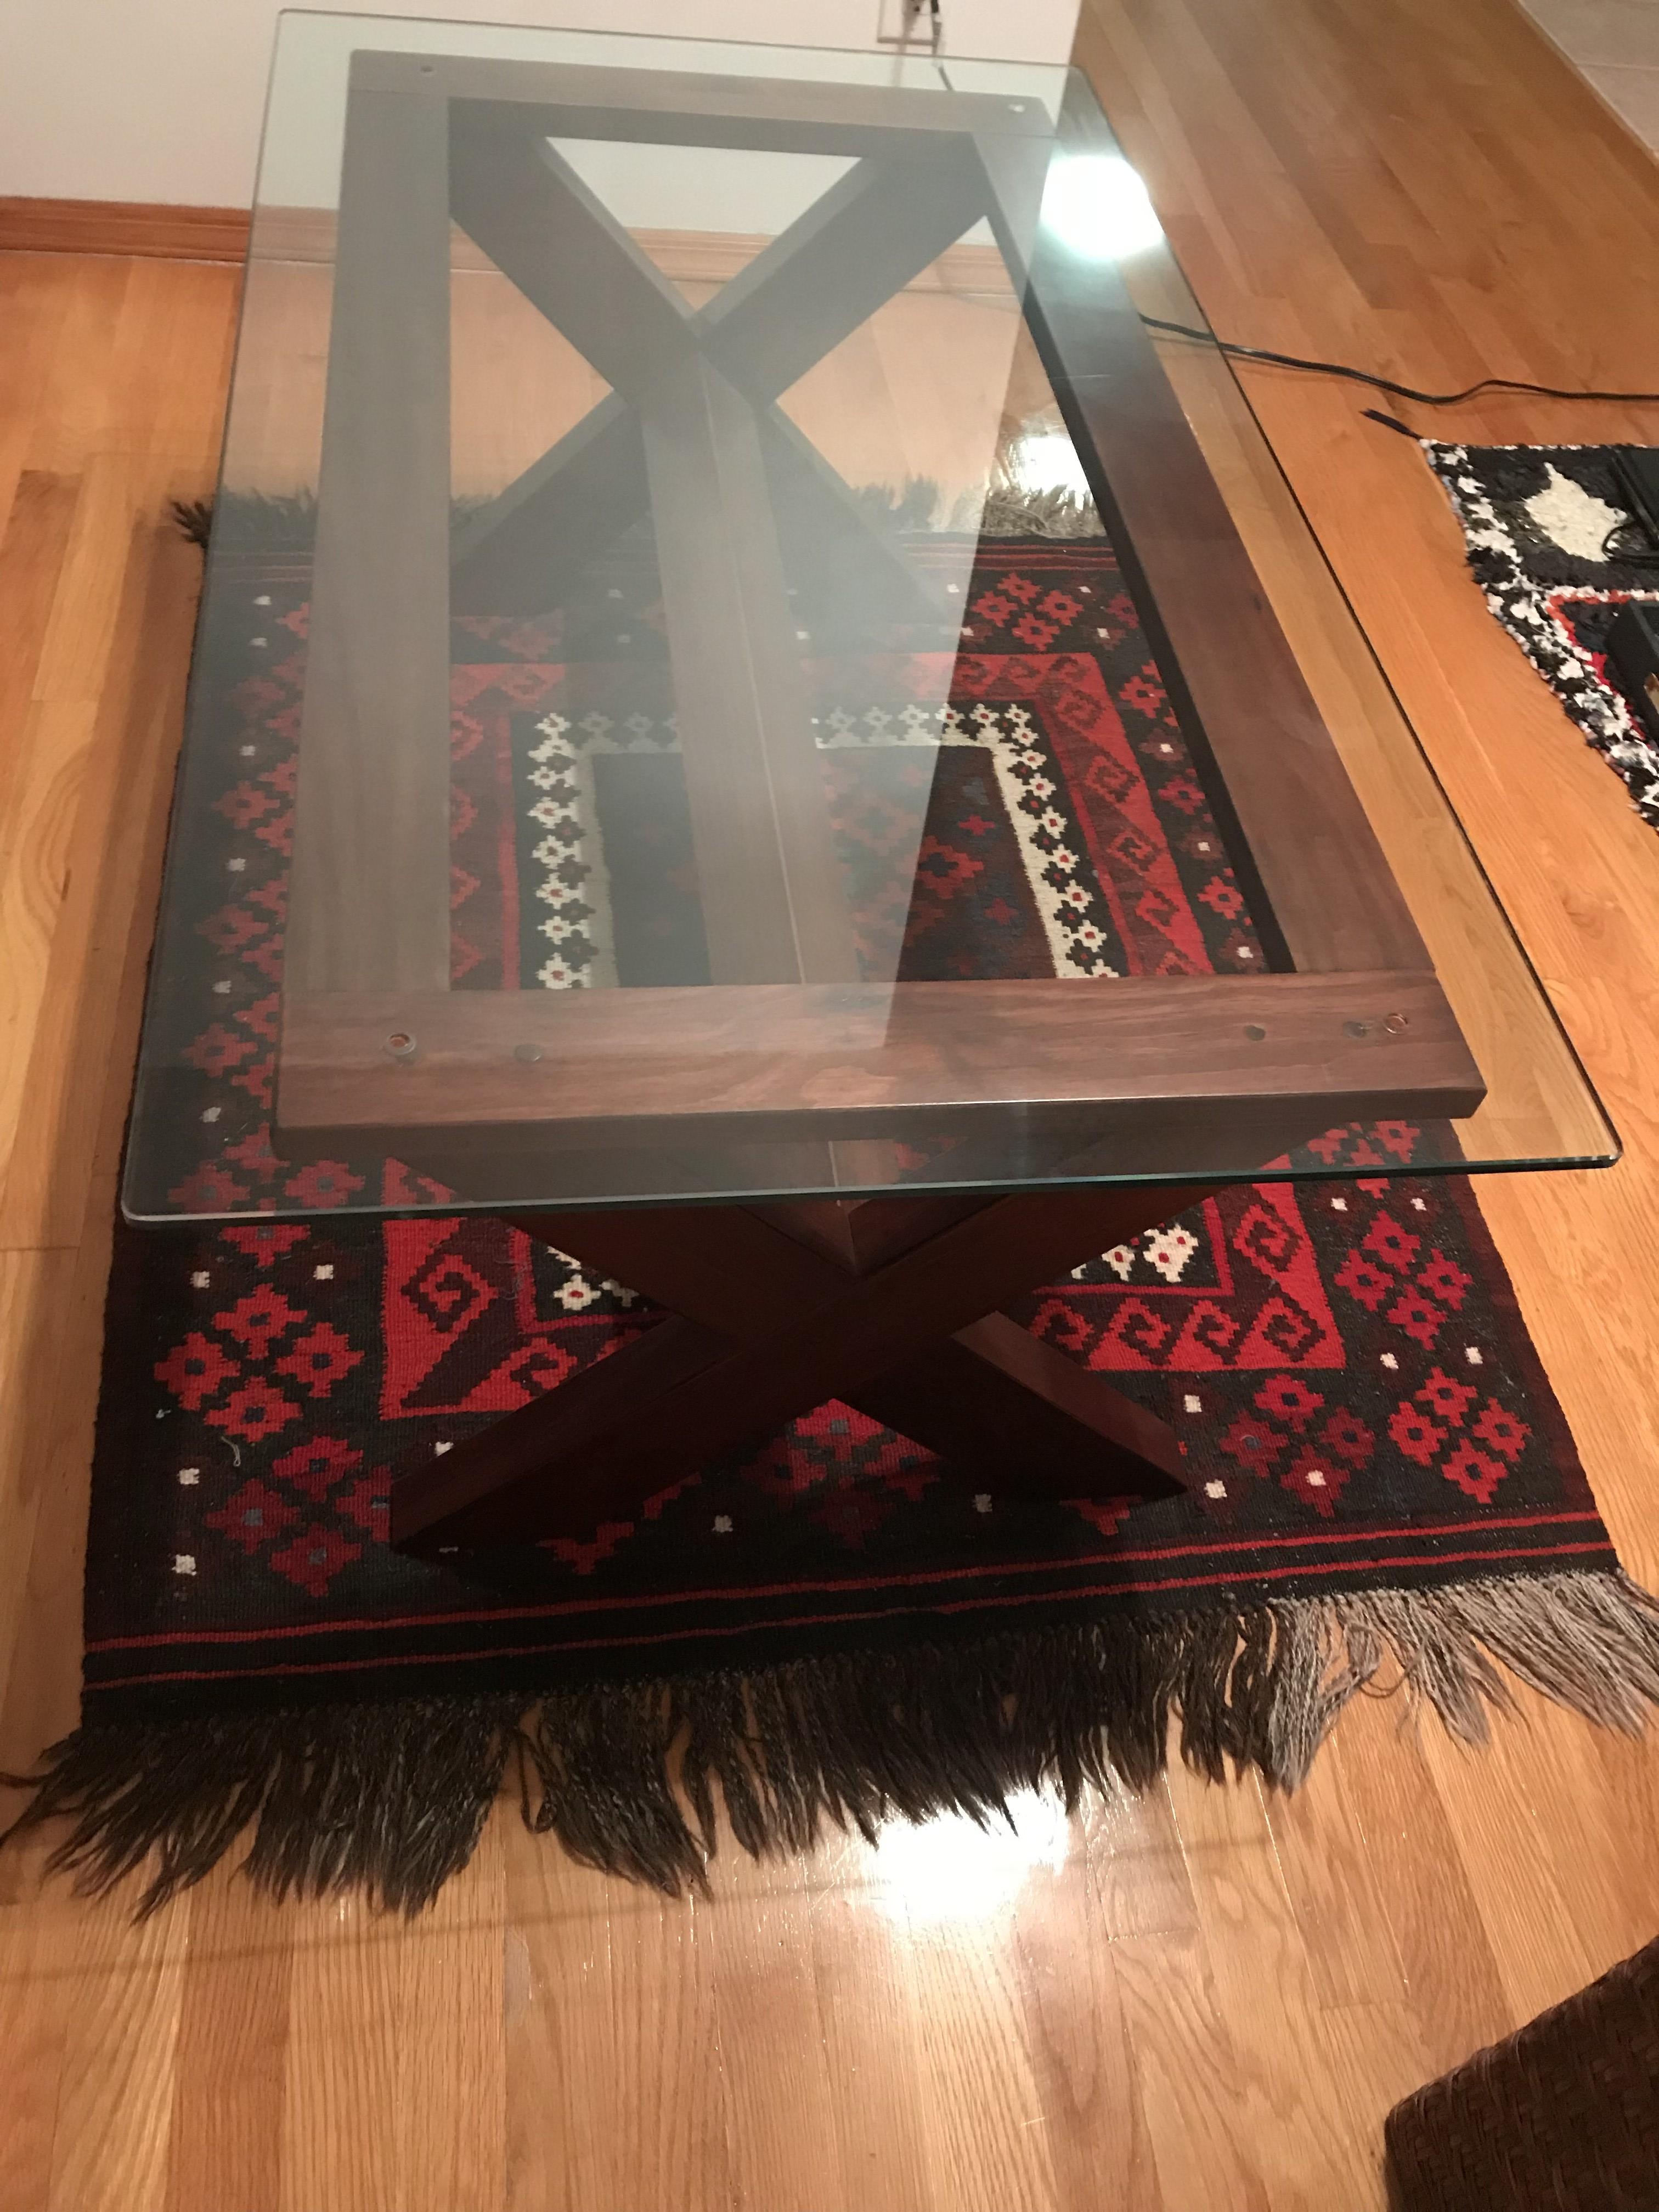 Ashley Cherry Wood Coffee Table w/ Glass Top